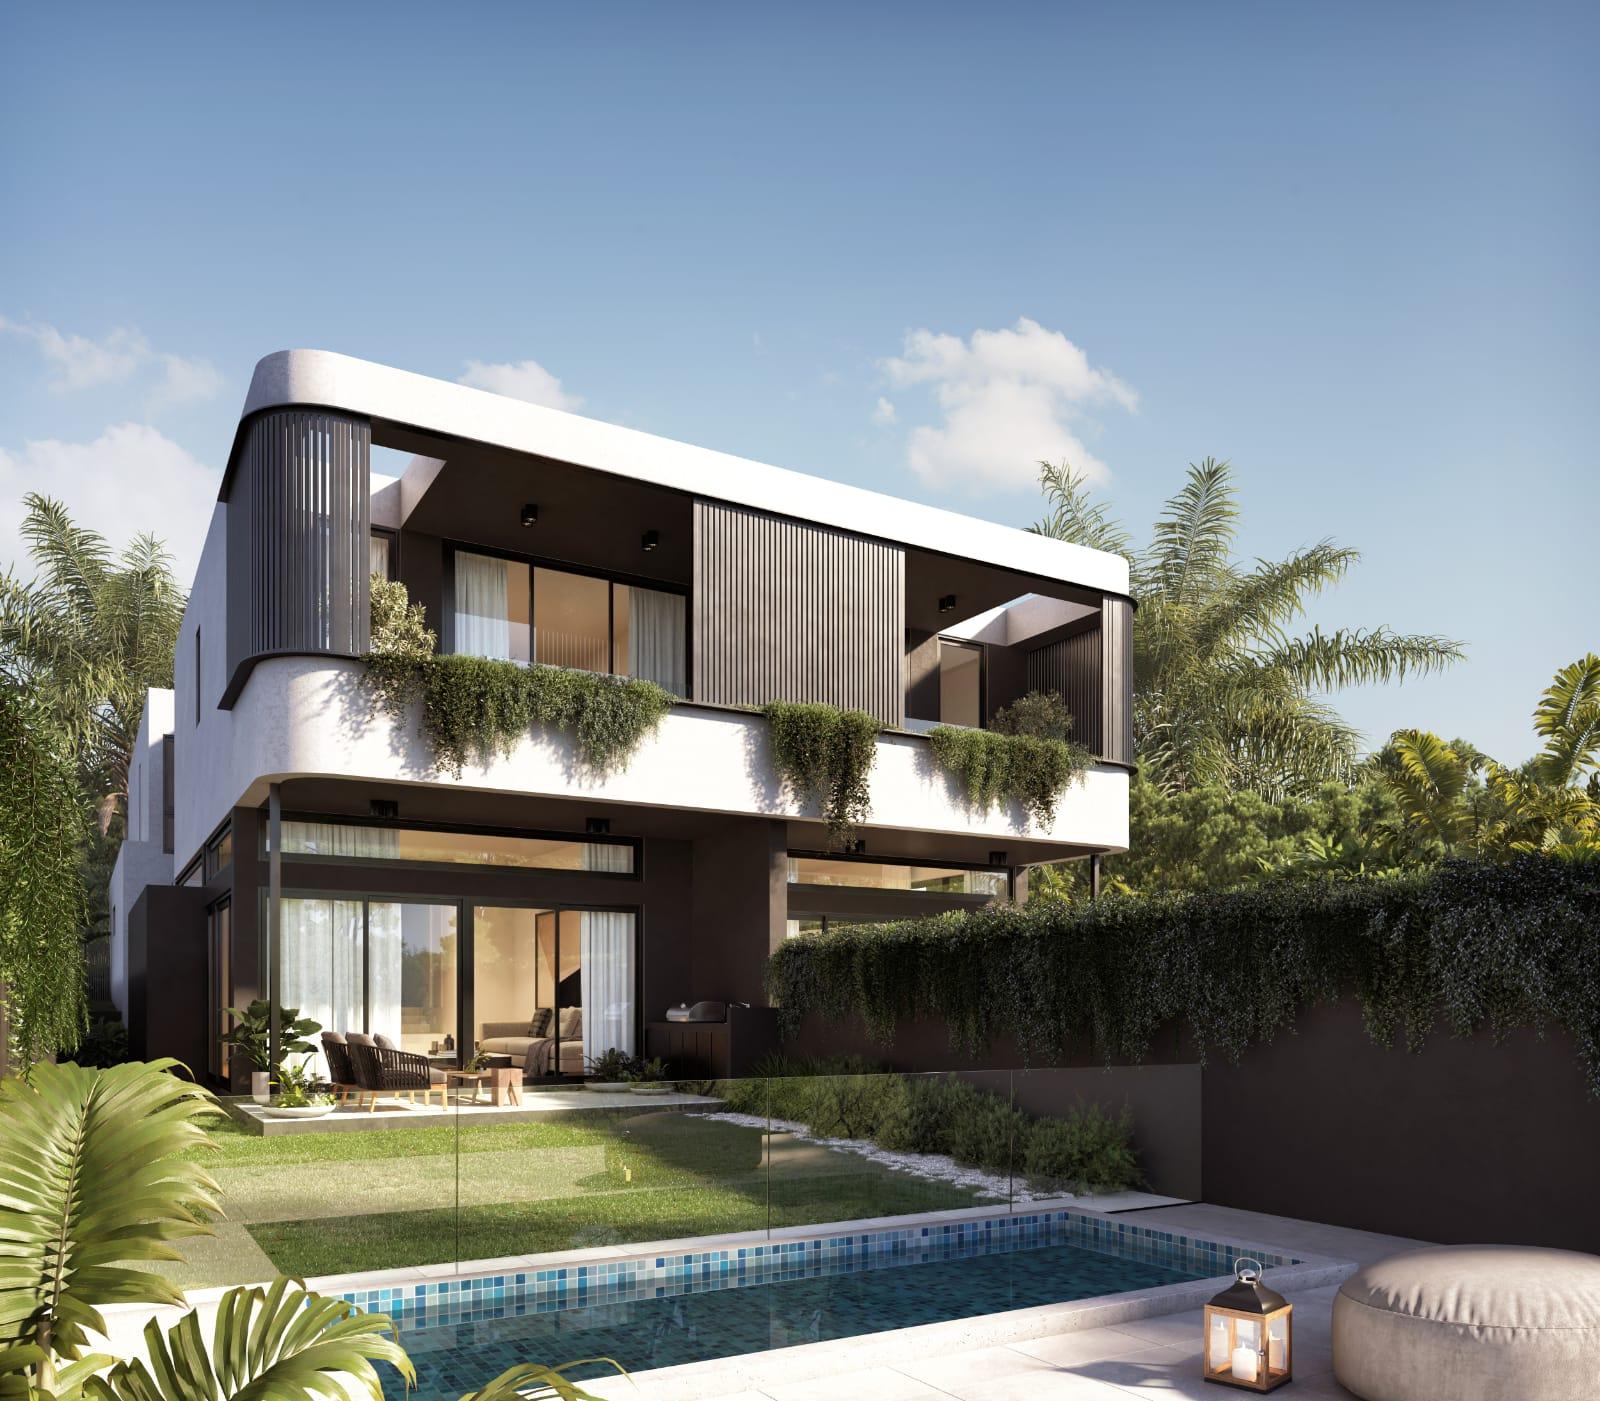 Built Lifestyles & EMK Architects - Chifley Duplex Project, Sydney